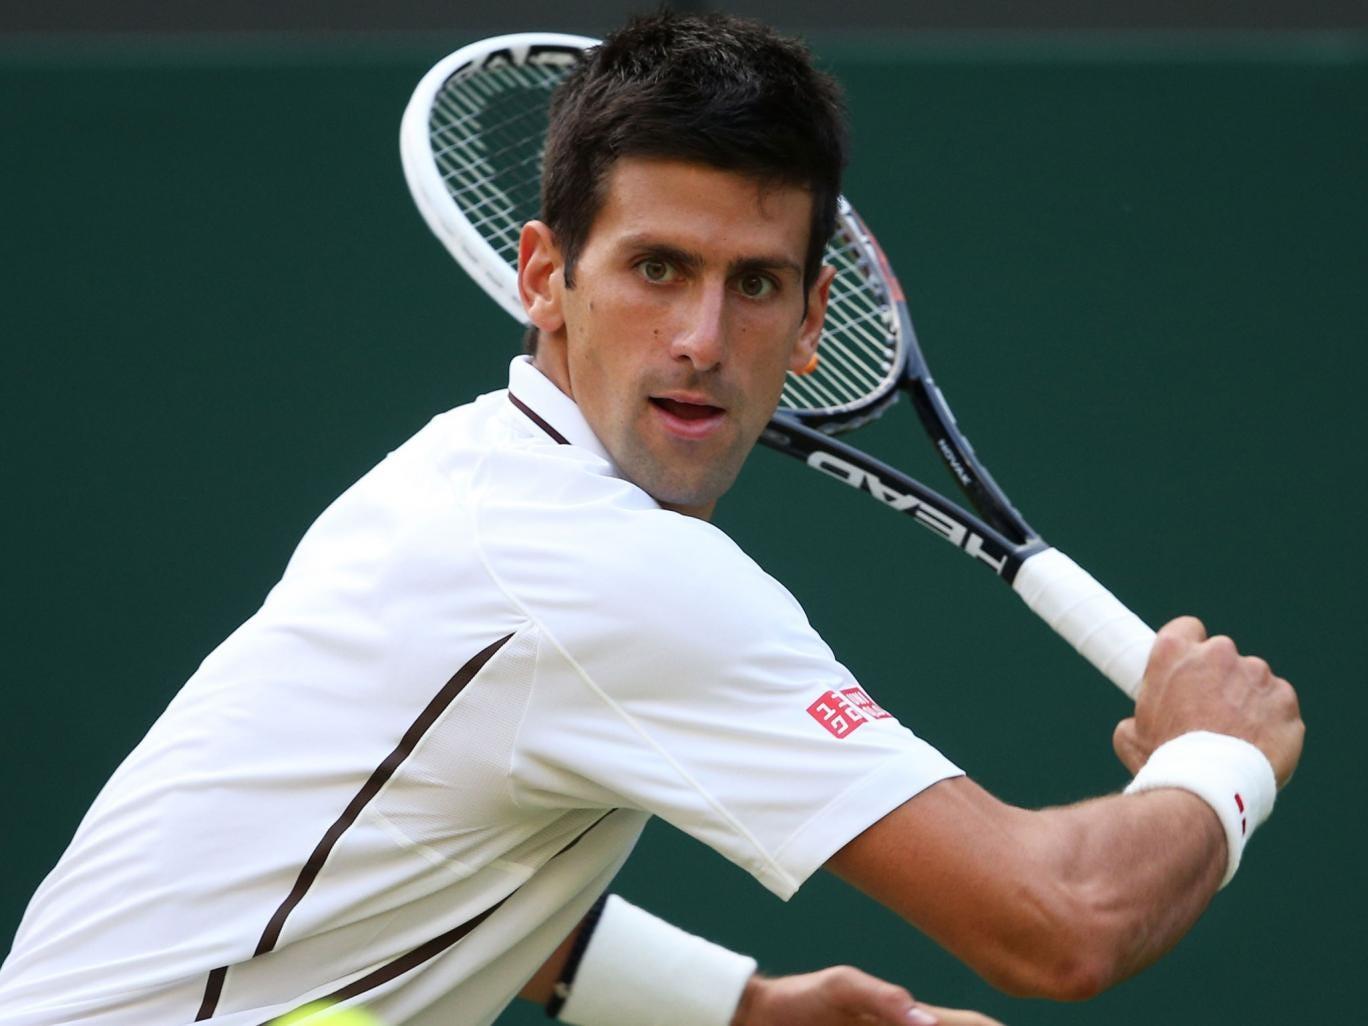 Novak Djokovic plays a backhand against Jeremy Chardy